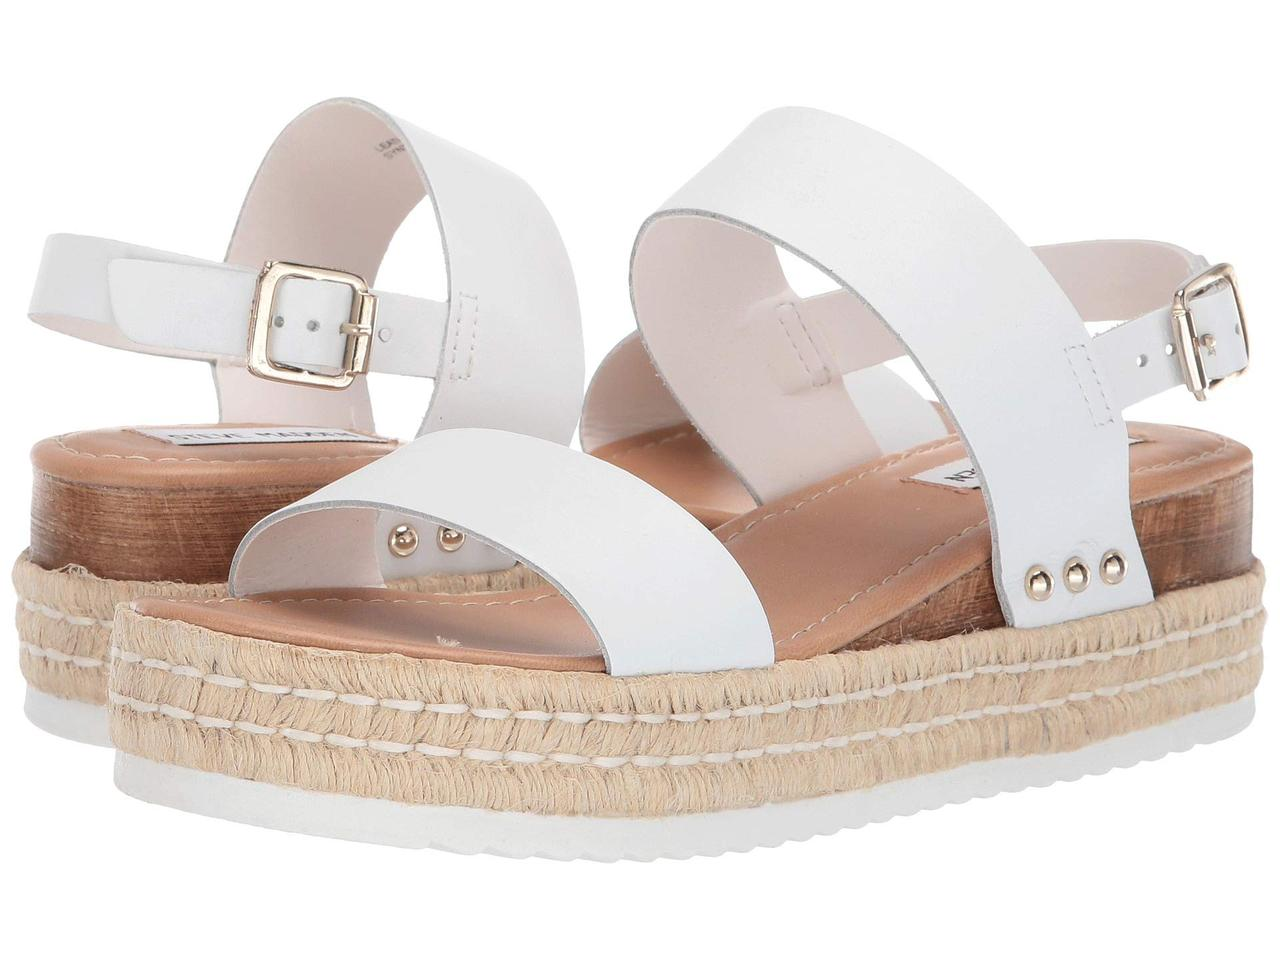 db22c14352c Туфли на каблуке (Оригинал) Steve Madden Catia Wedge Sandal White Leather